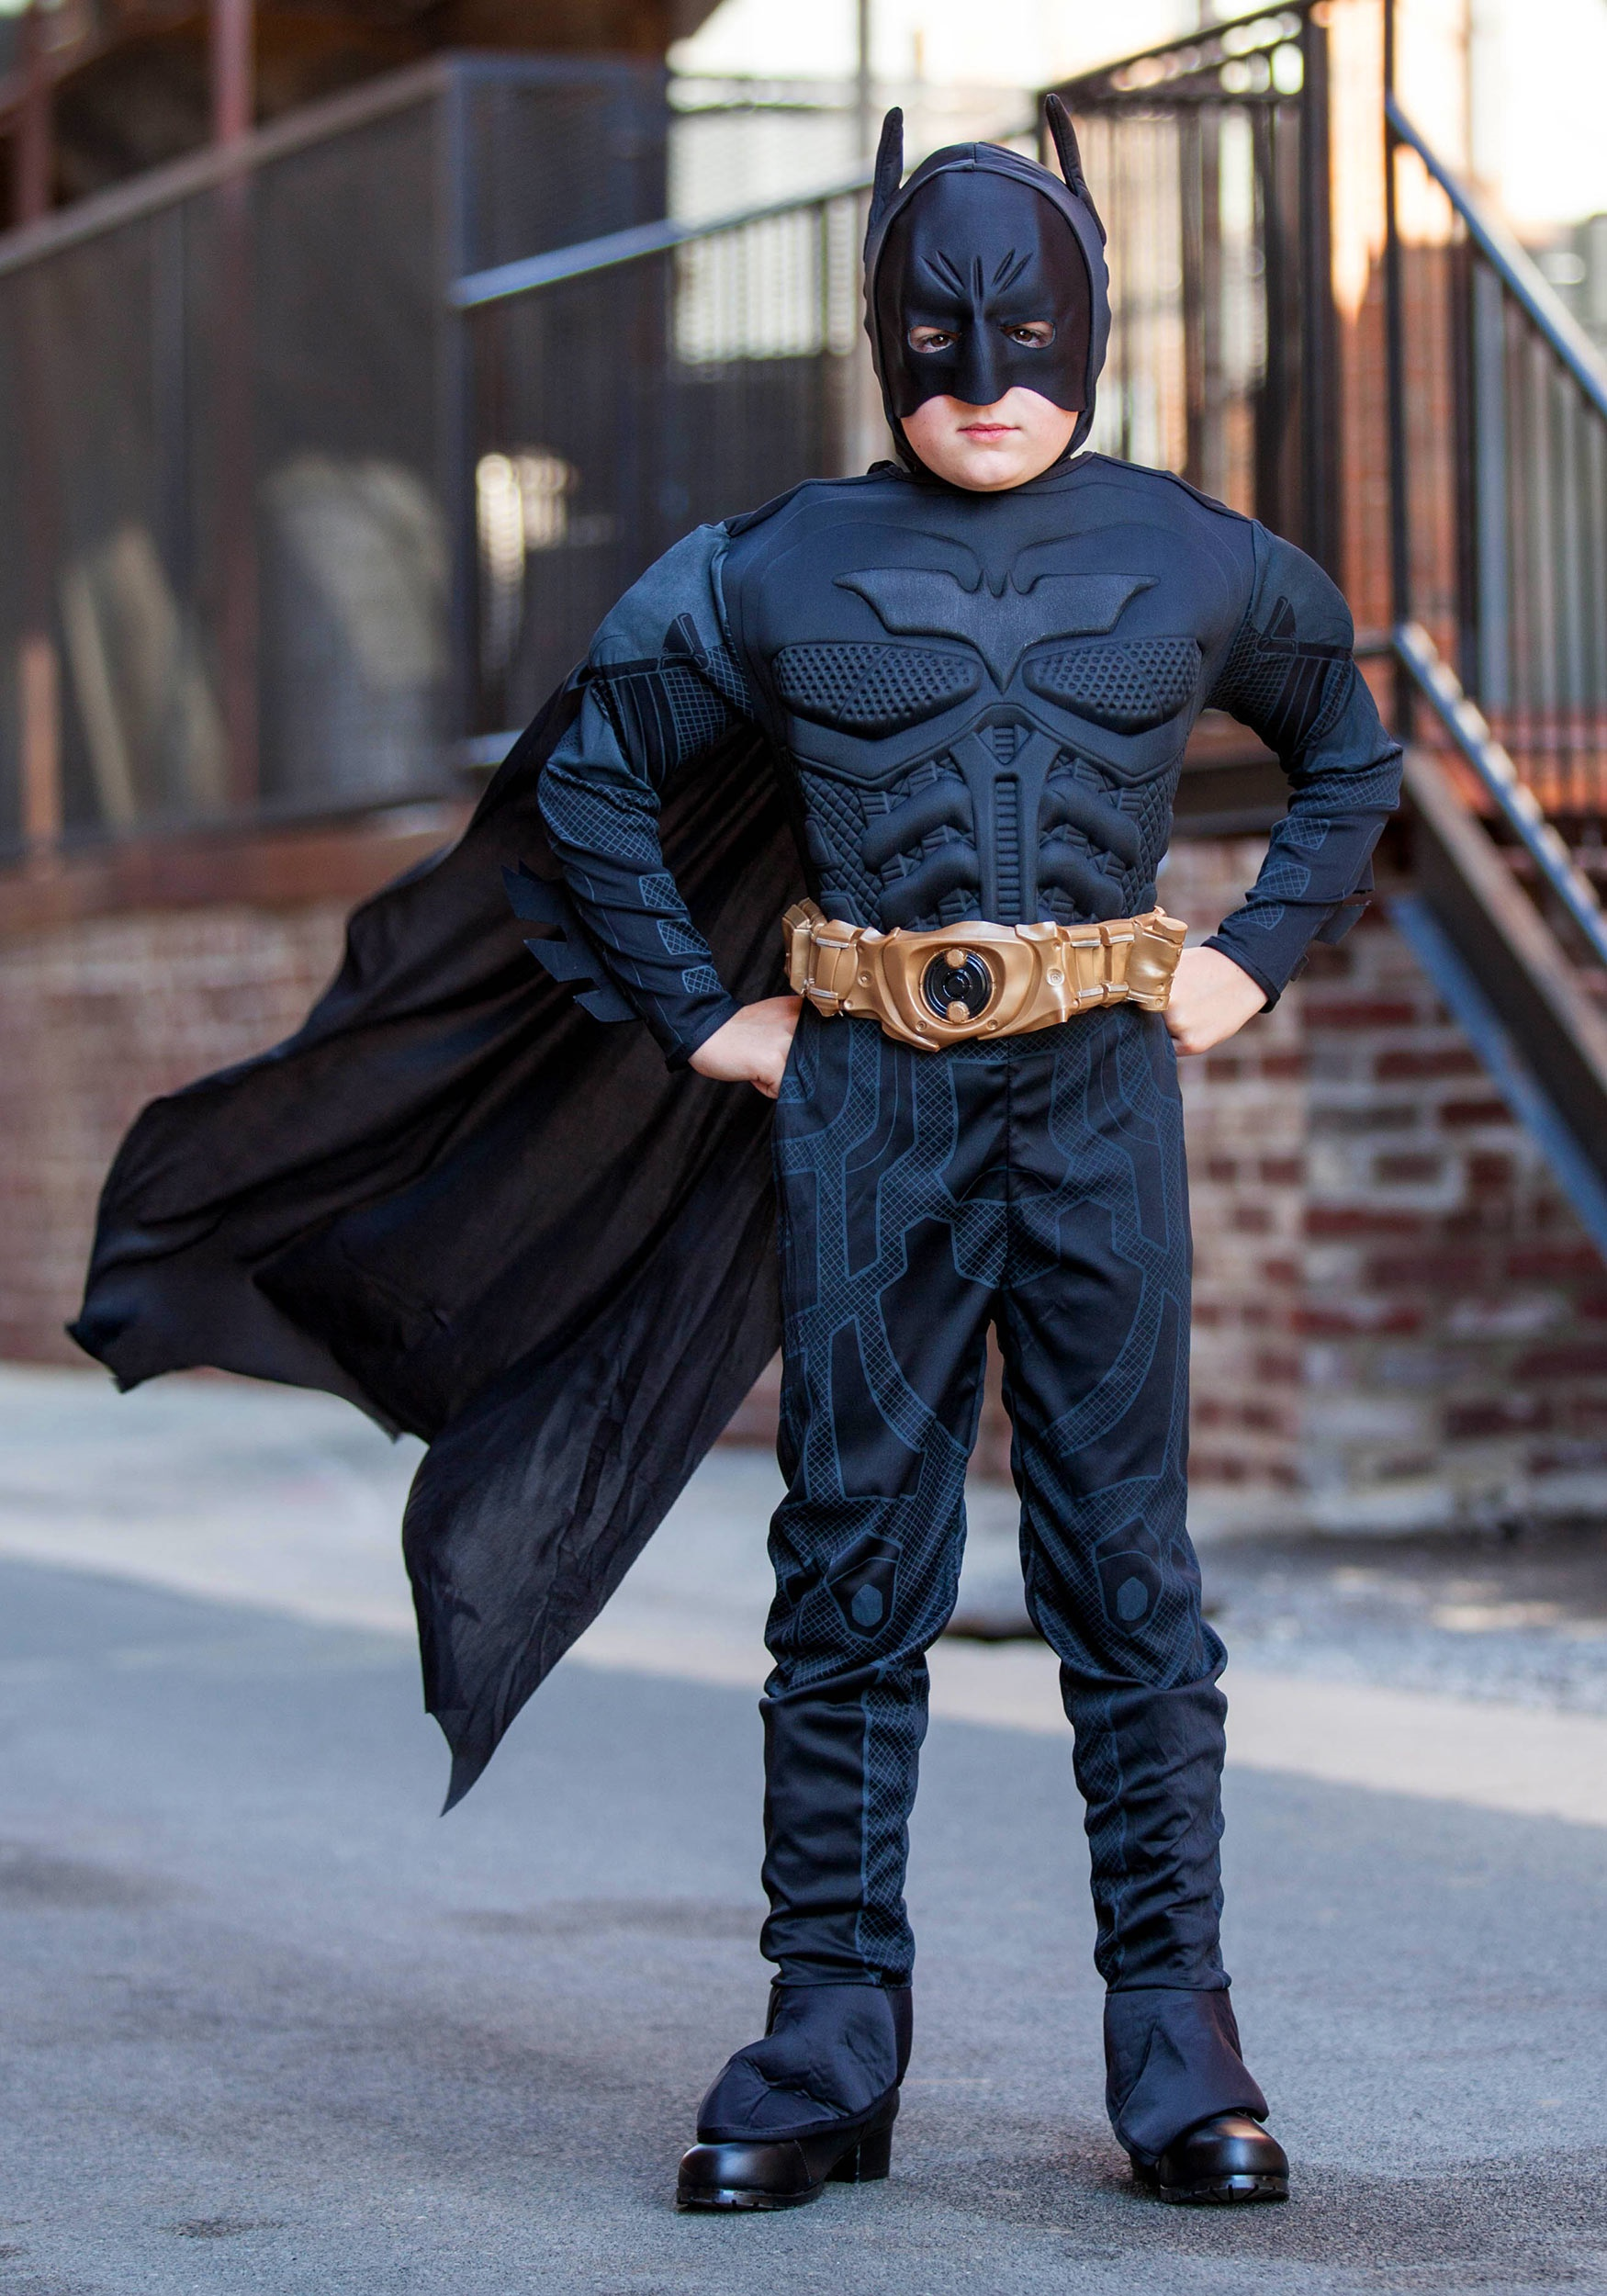 Batman Halloween Costume Toddler Batman Halloween Costumes